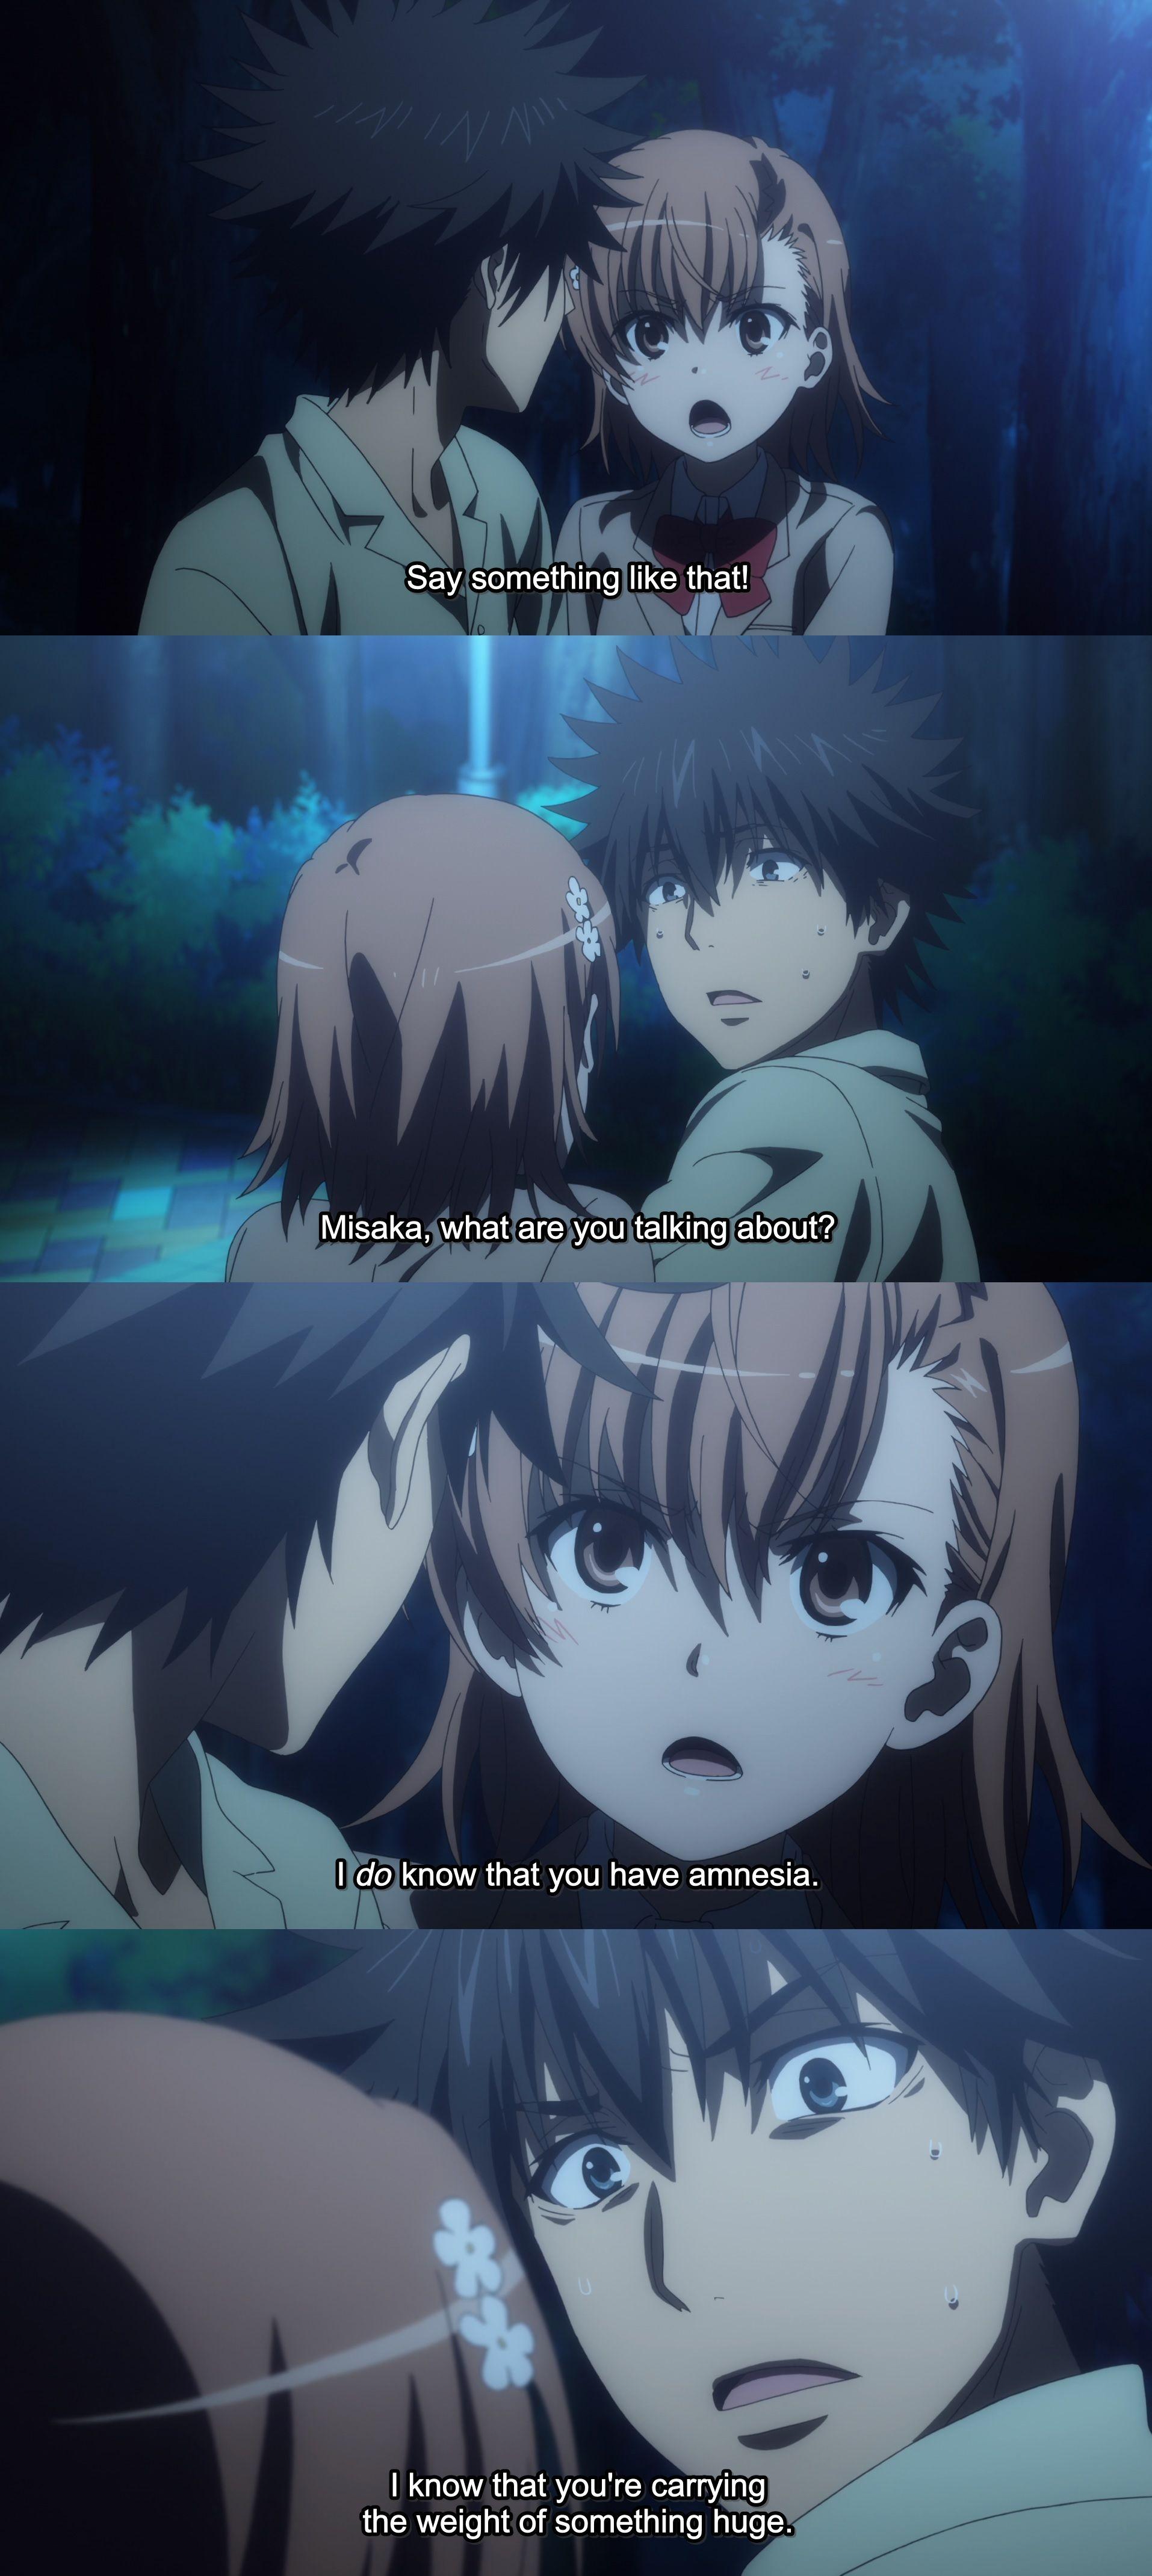 Mikoto Touma Index S3 Ep9 Anime Anime Fandom A Certain Scientific Railgun